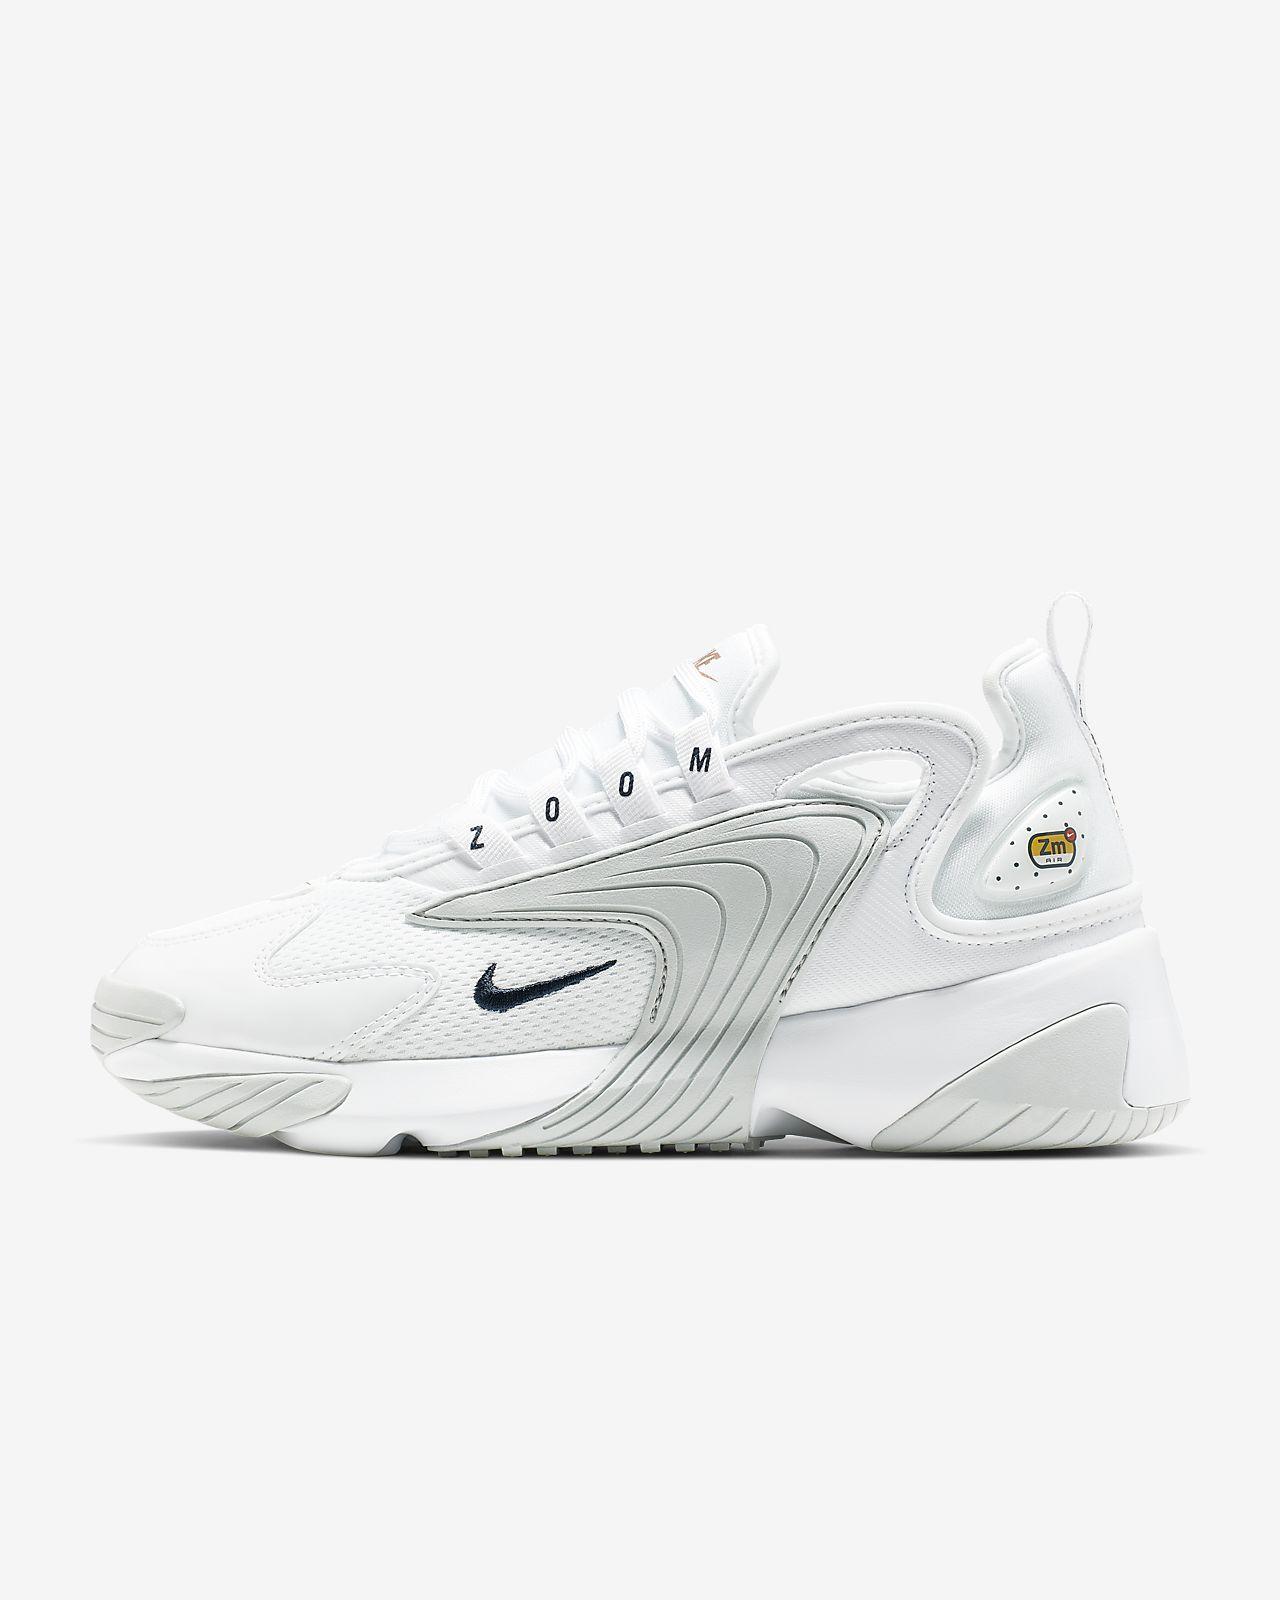 Nike Zoom 2K Unité Totale Damesschoen